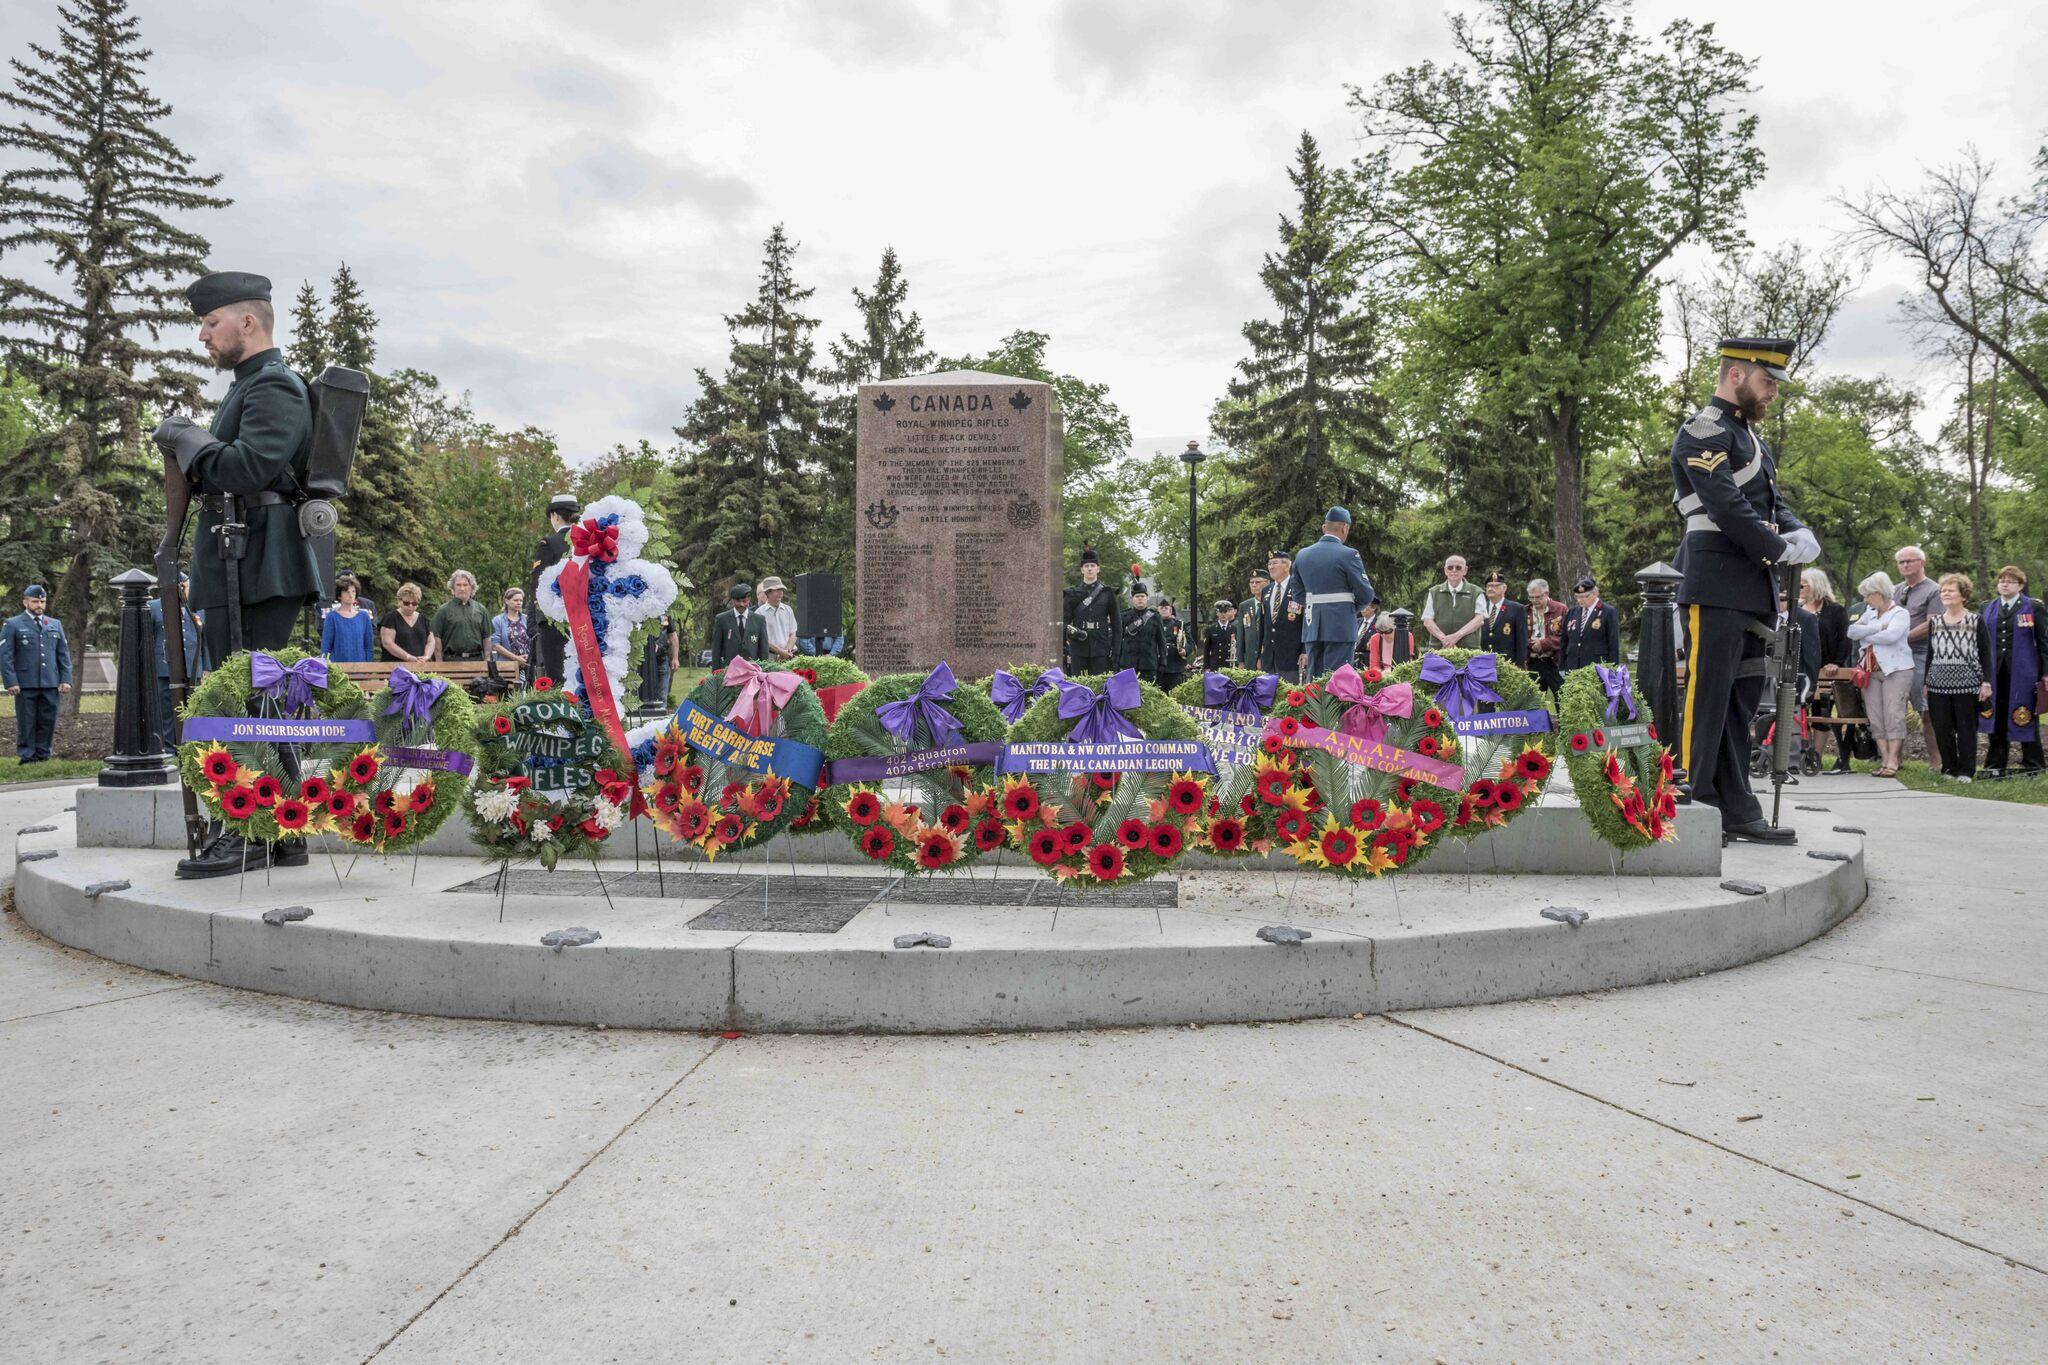 The Royal Winnipeg Rifles' Regimental Monument at Vimy Ridge Memorial Park in Winnipeg